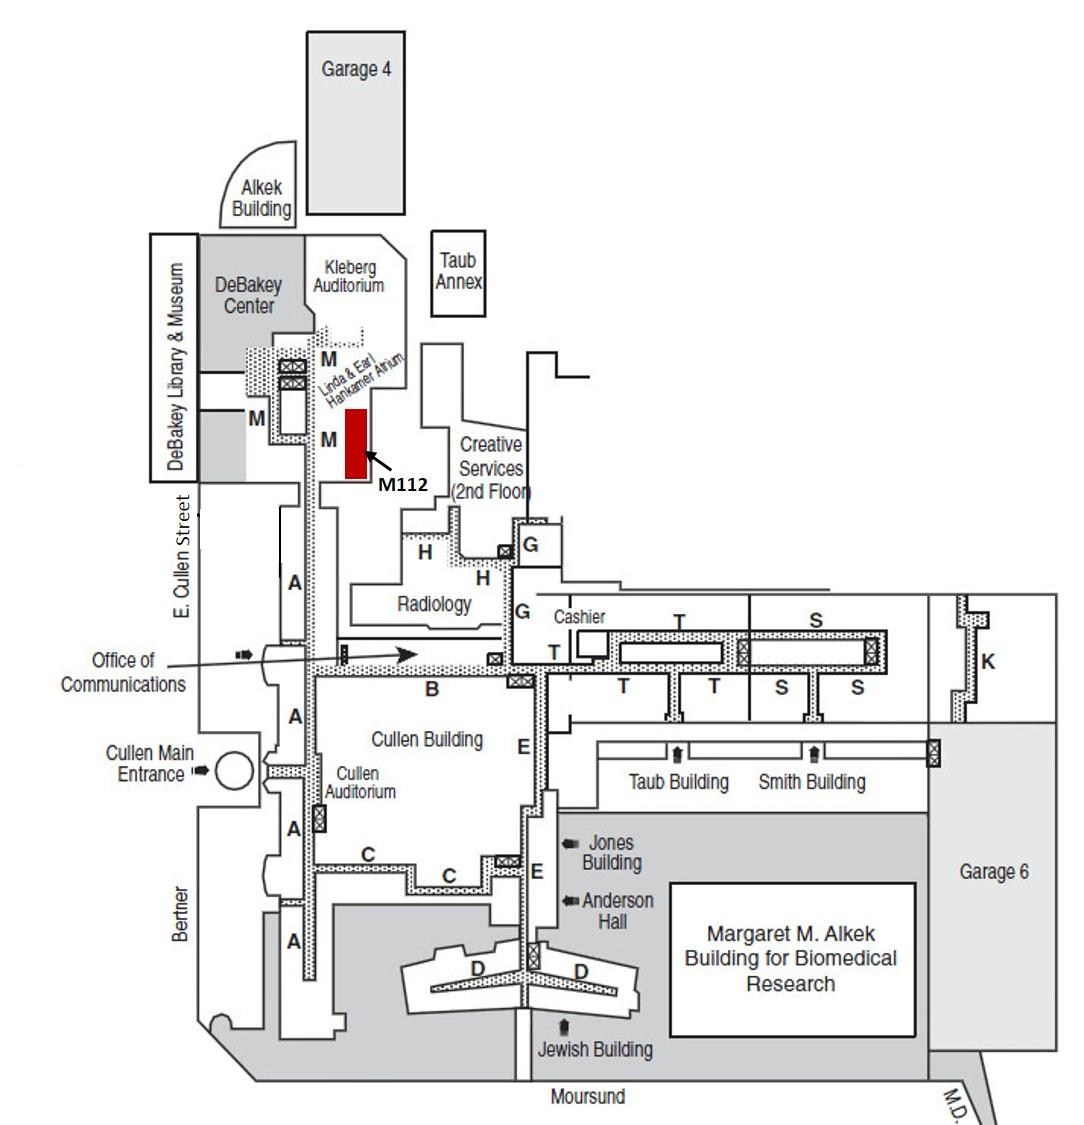 Mouse Genome Informatics practical workshop: Baylor College of